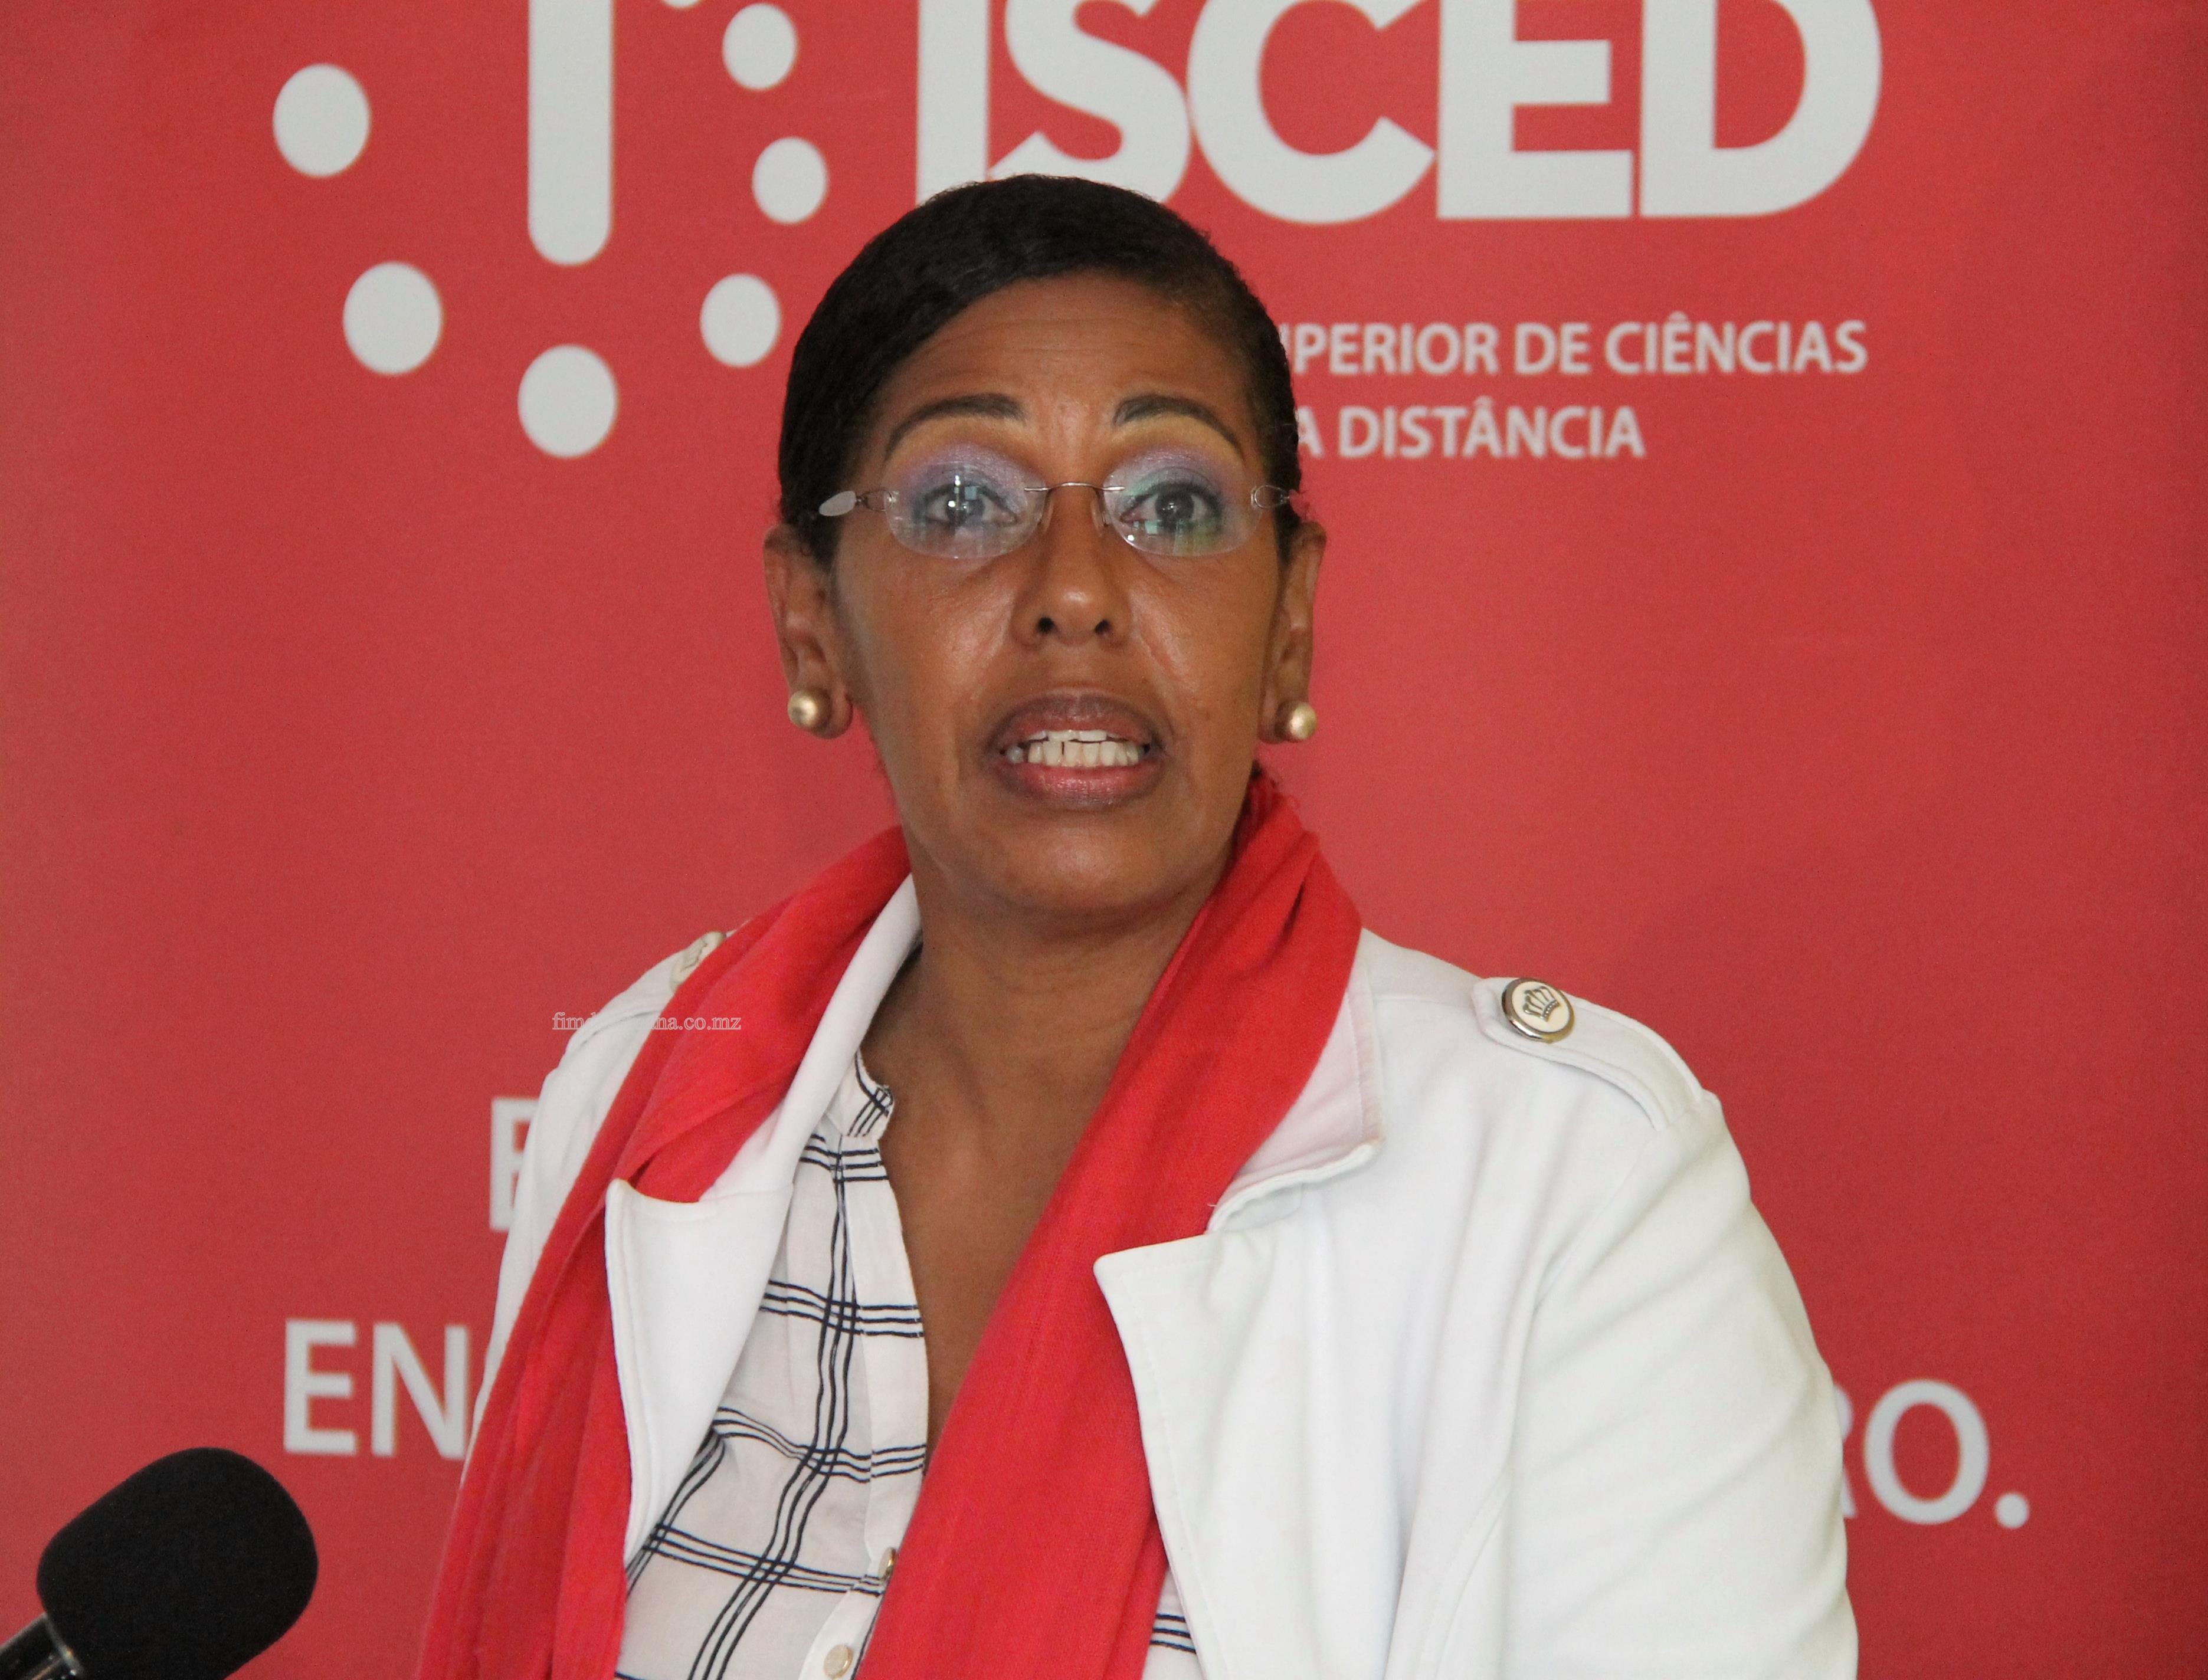 Sandra Brito - Directora Nacional do Ensino Superior no Ministerio da Ciencia Tecnologia Ensino Superior e Tecnico Profissional